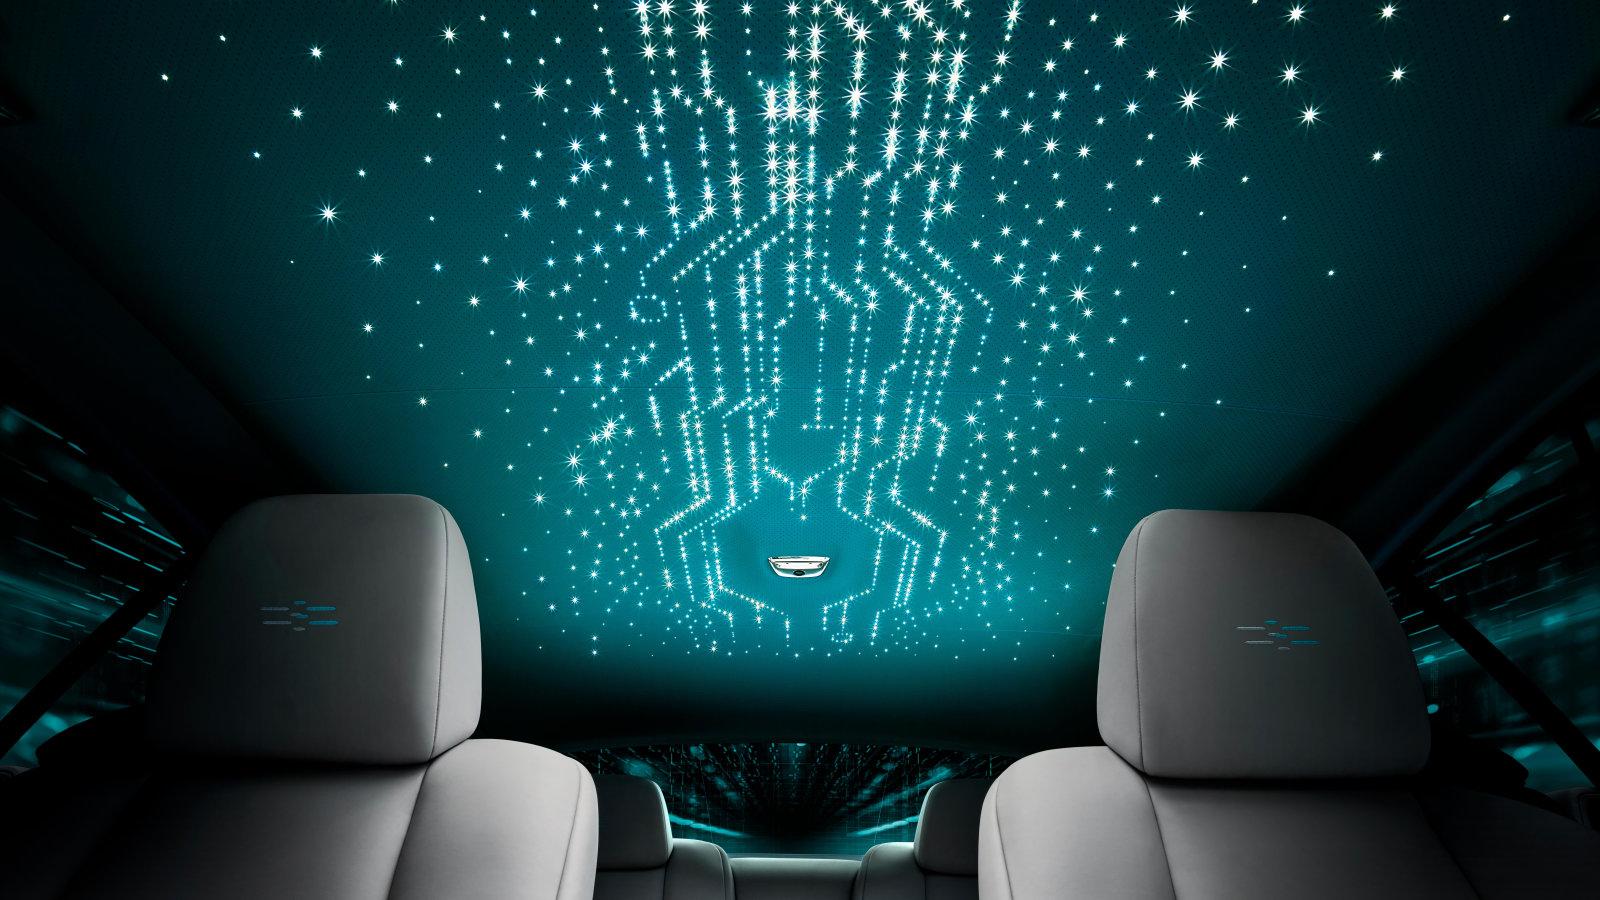 Rolls-Royce Wraith Kryptos has an integrated surprise encrypted cipher